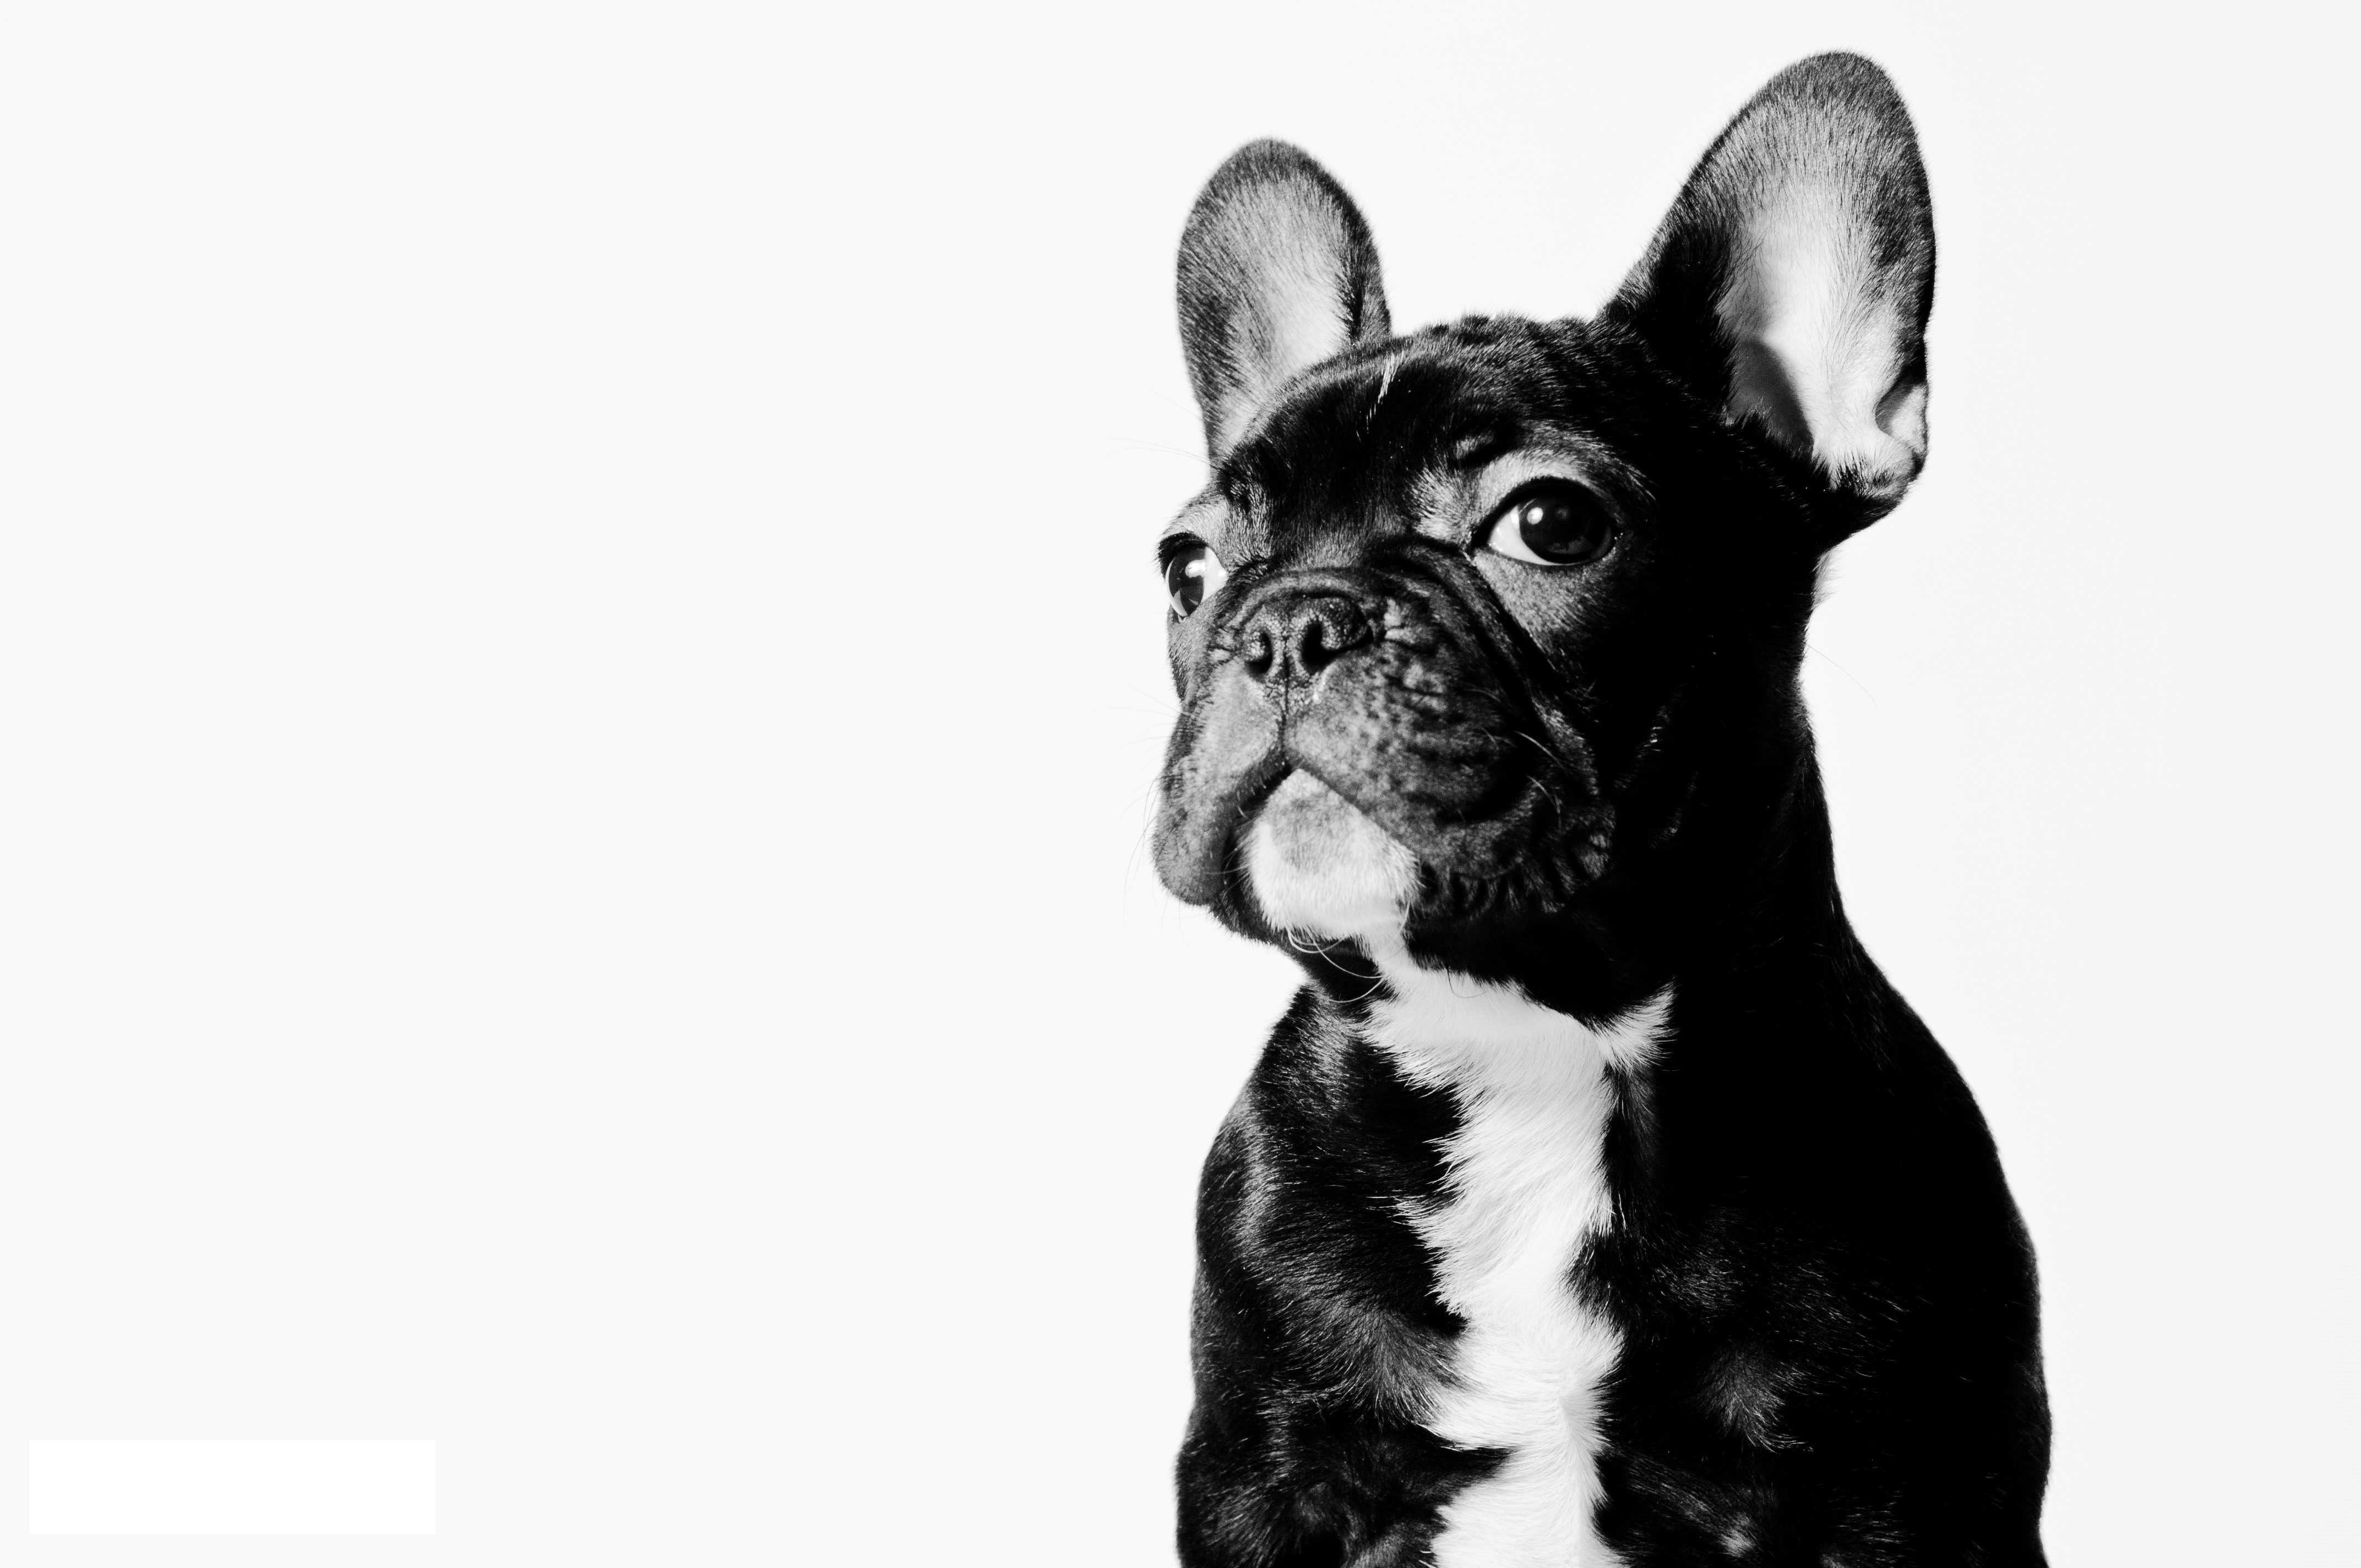 Dogs French Bulldog Dog Dogs Bulldogs Puppy Puppies Wallpaper Hd